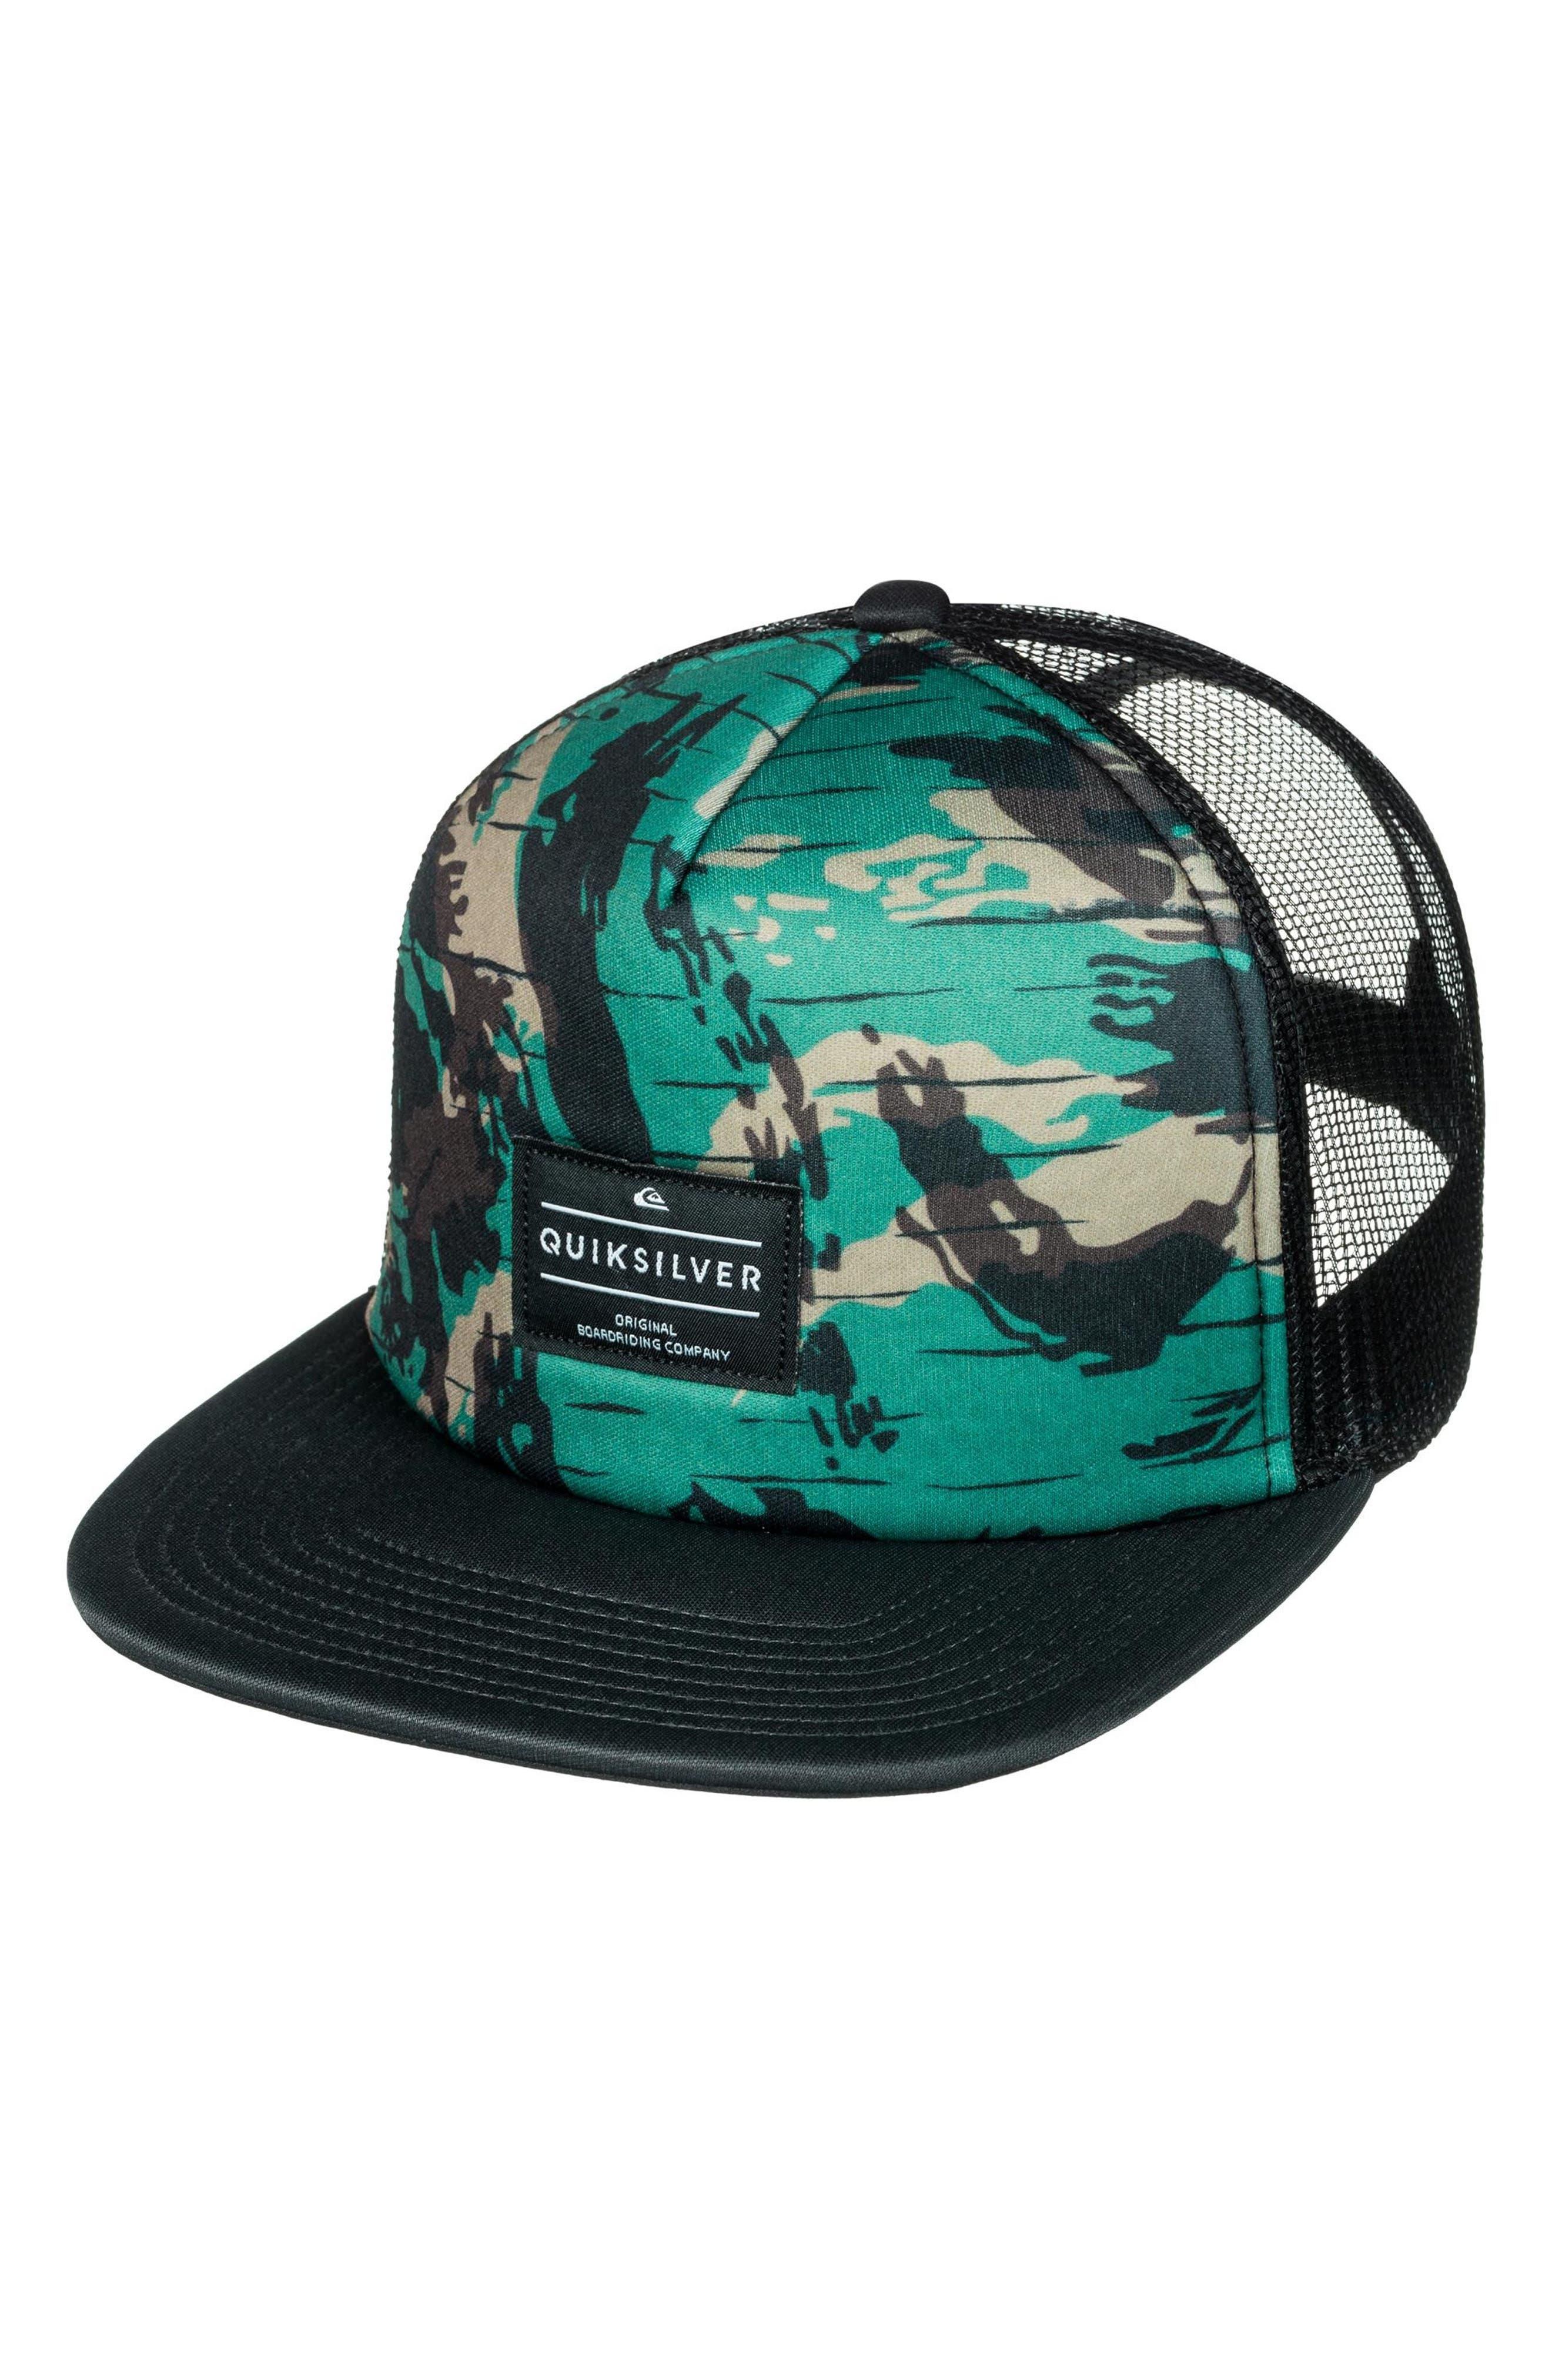 Brissells Trucker Hat,                         Main,                         color,